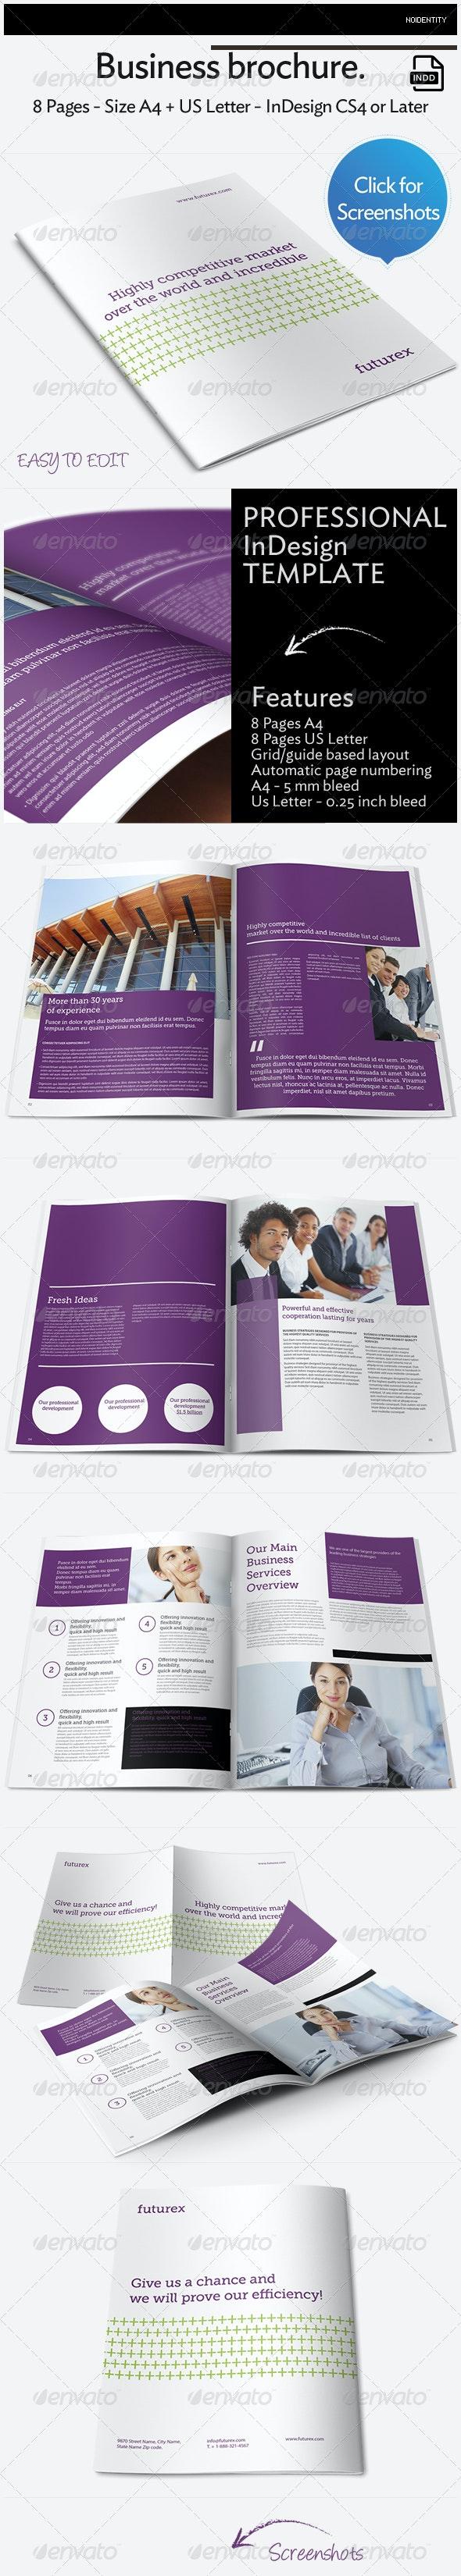 Futurex Business Brochure - Brochures Print Templates